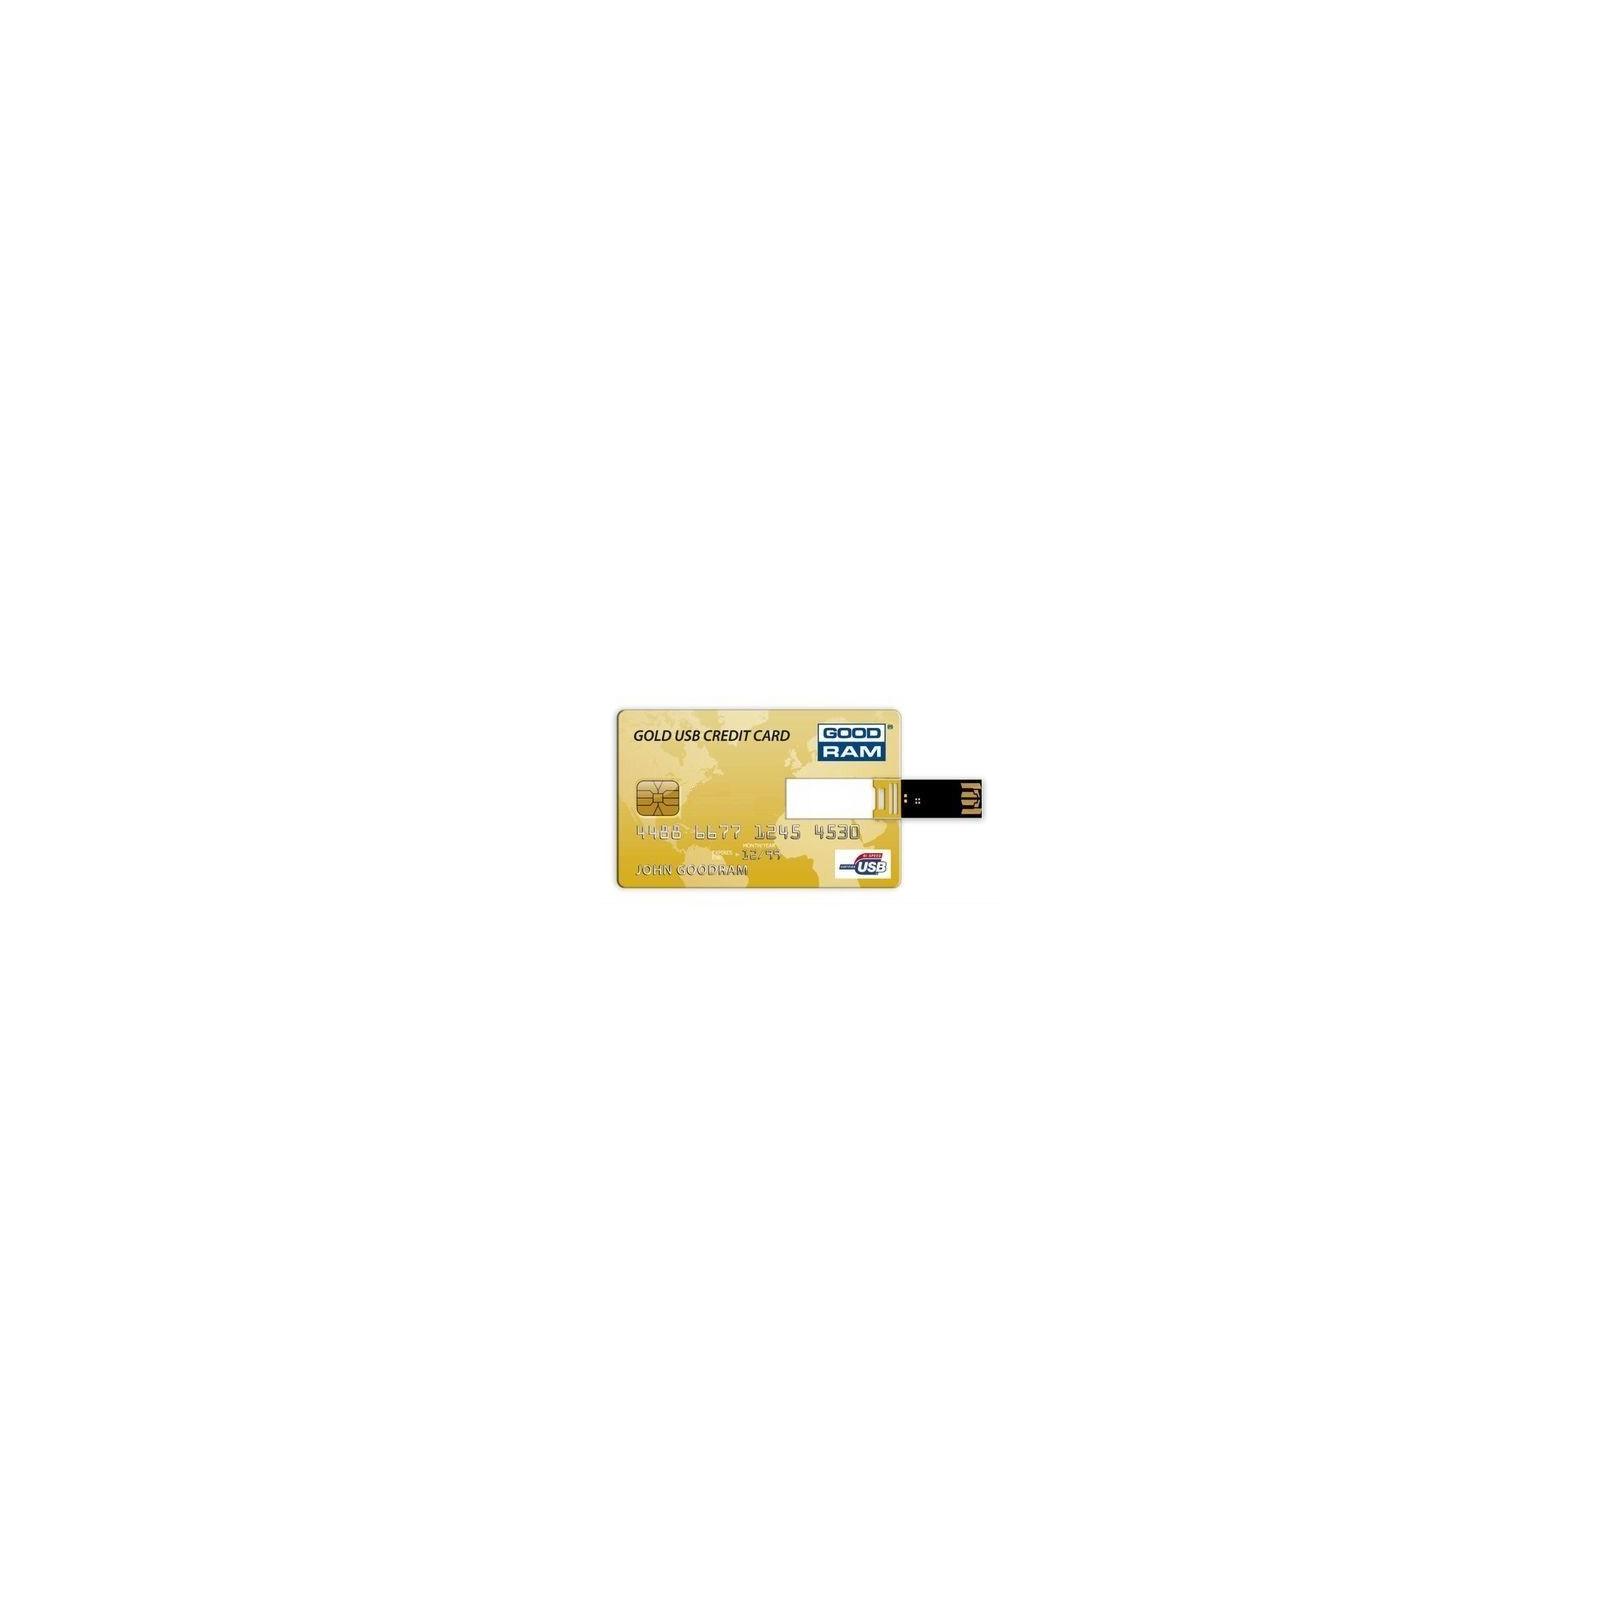 USB флеш накопитель GOODRAM 8Gb Gold Credit Card (PD8GH2GRCCPR9)